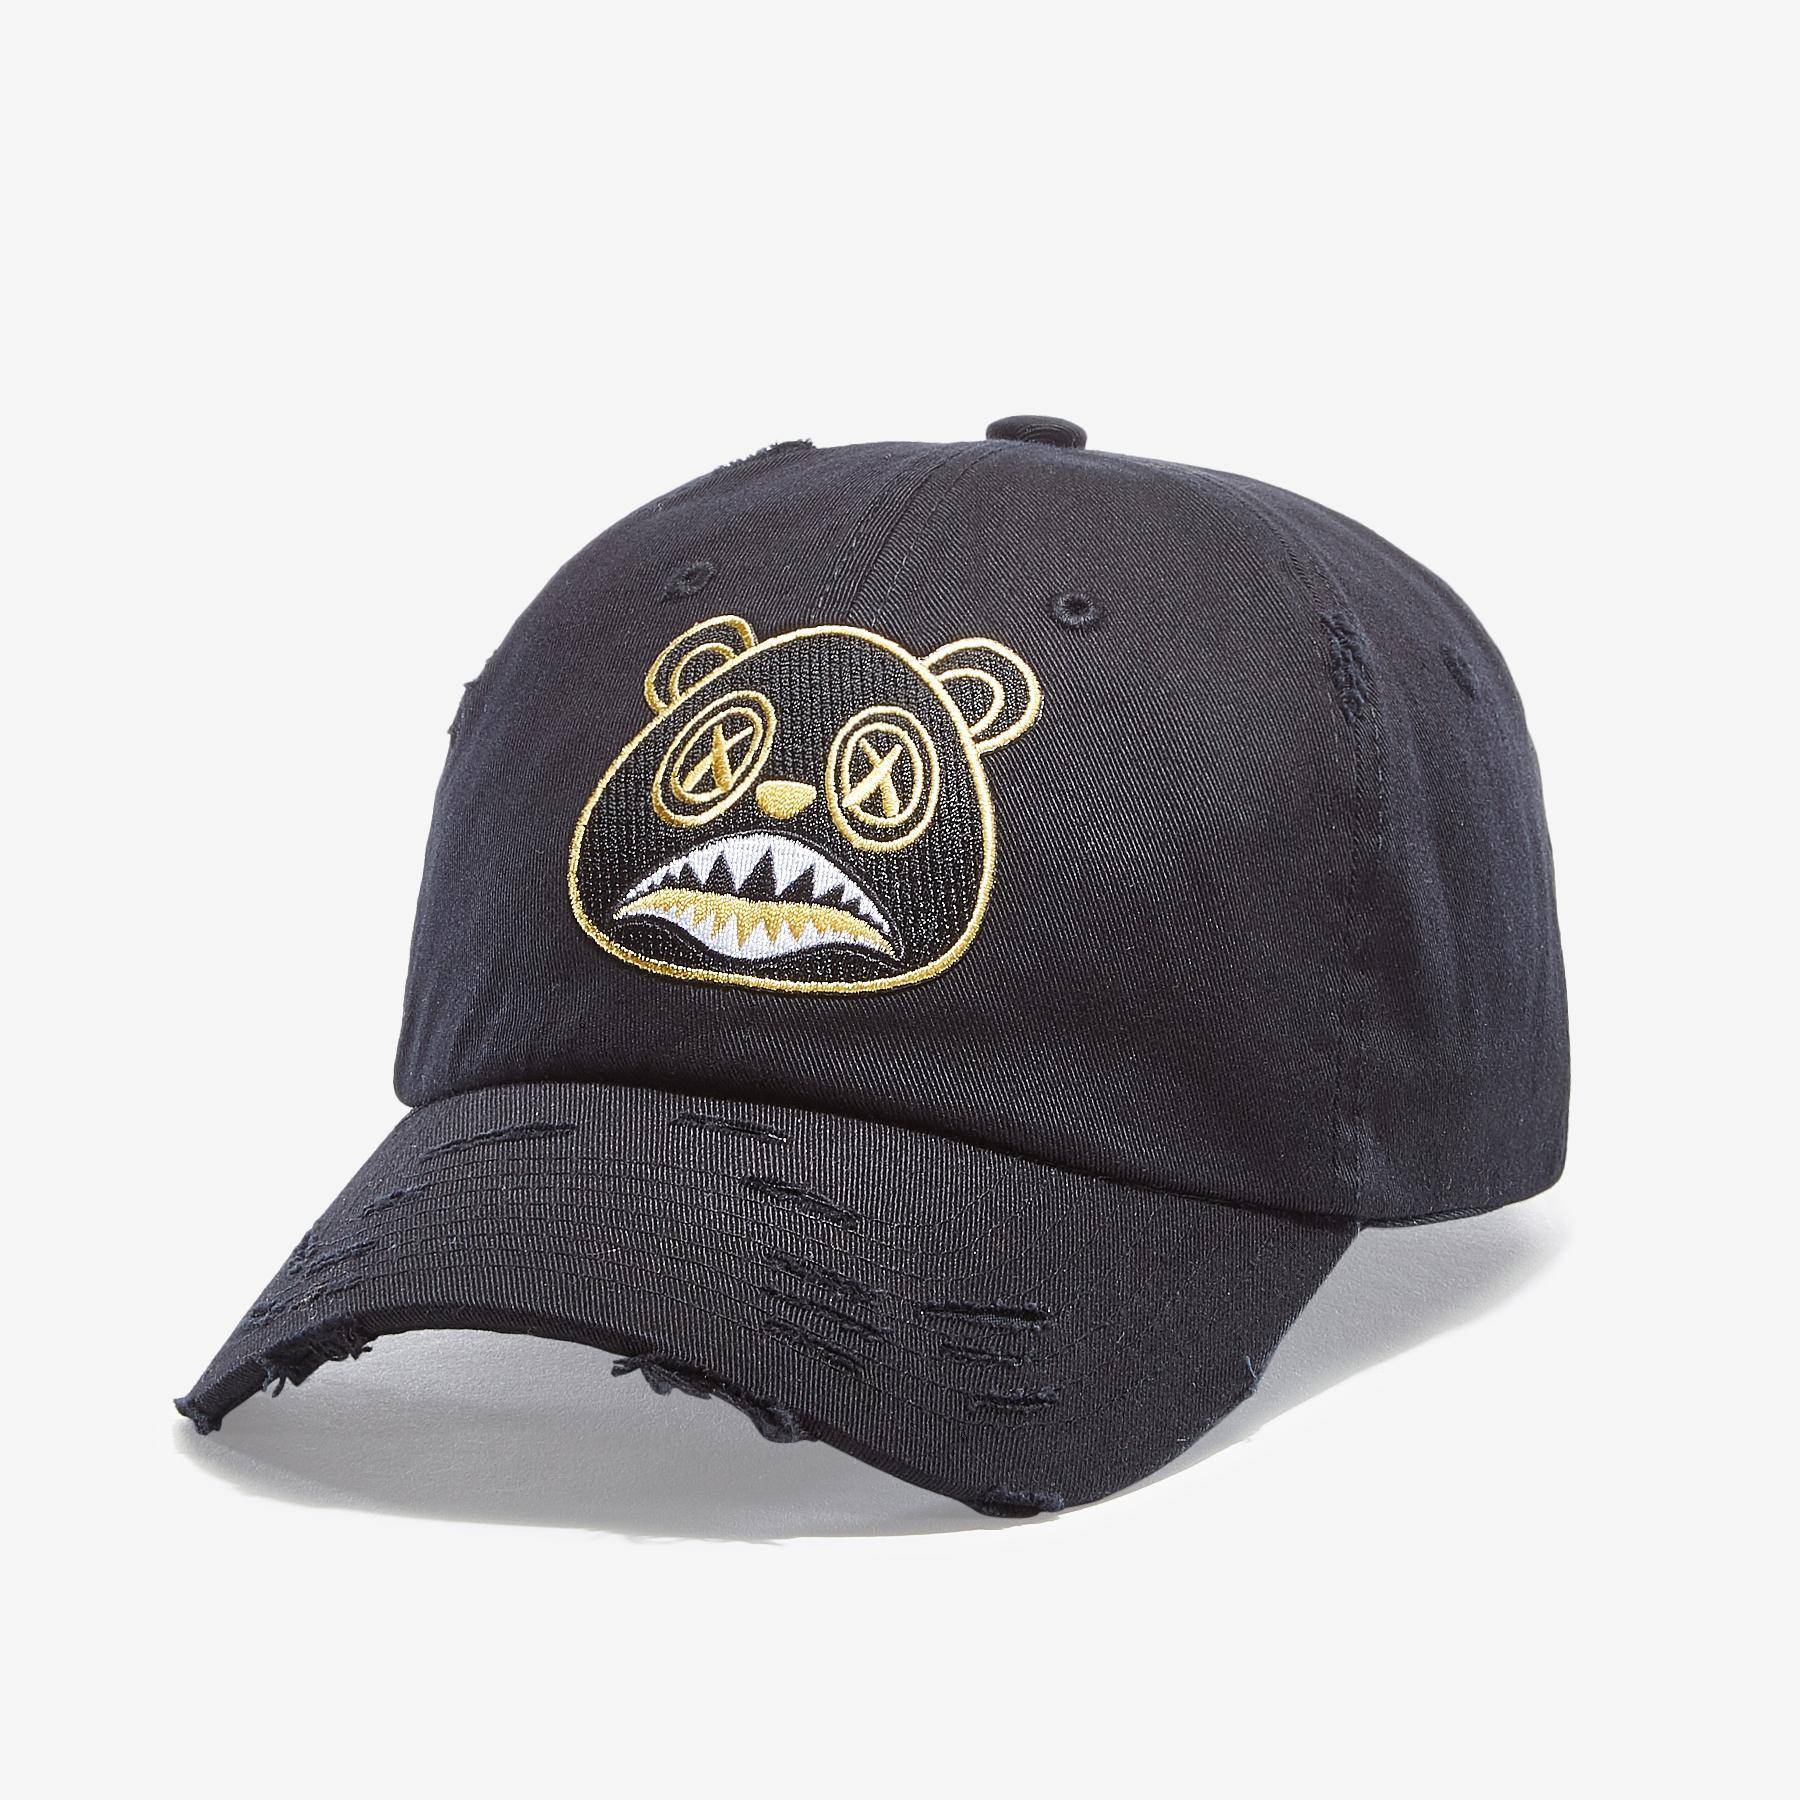 Blackout Gold Hat